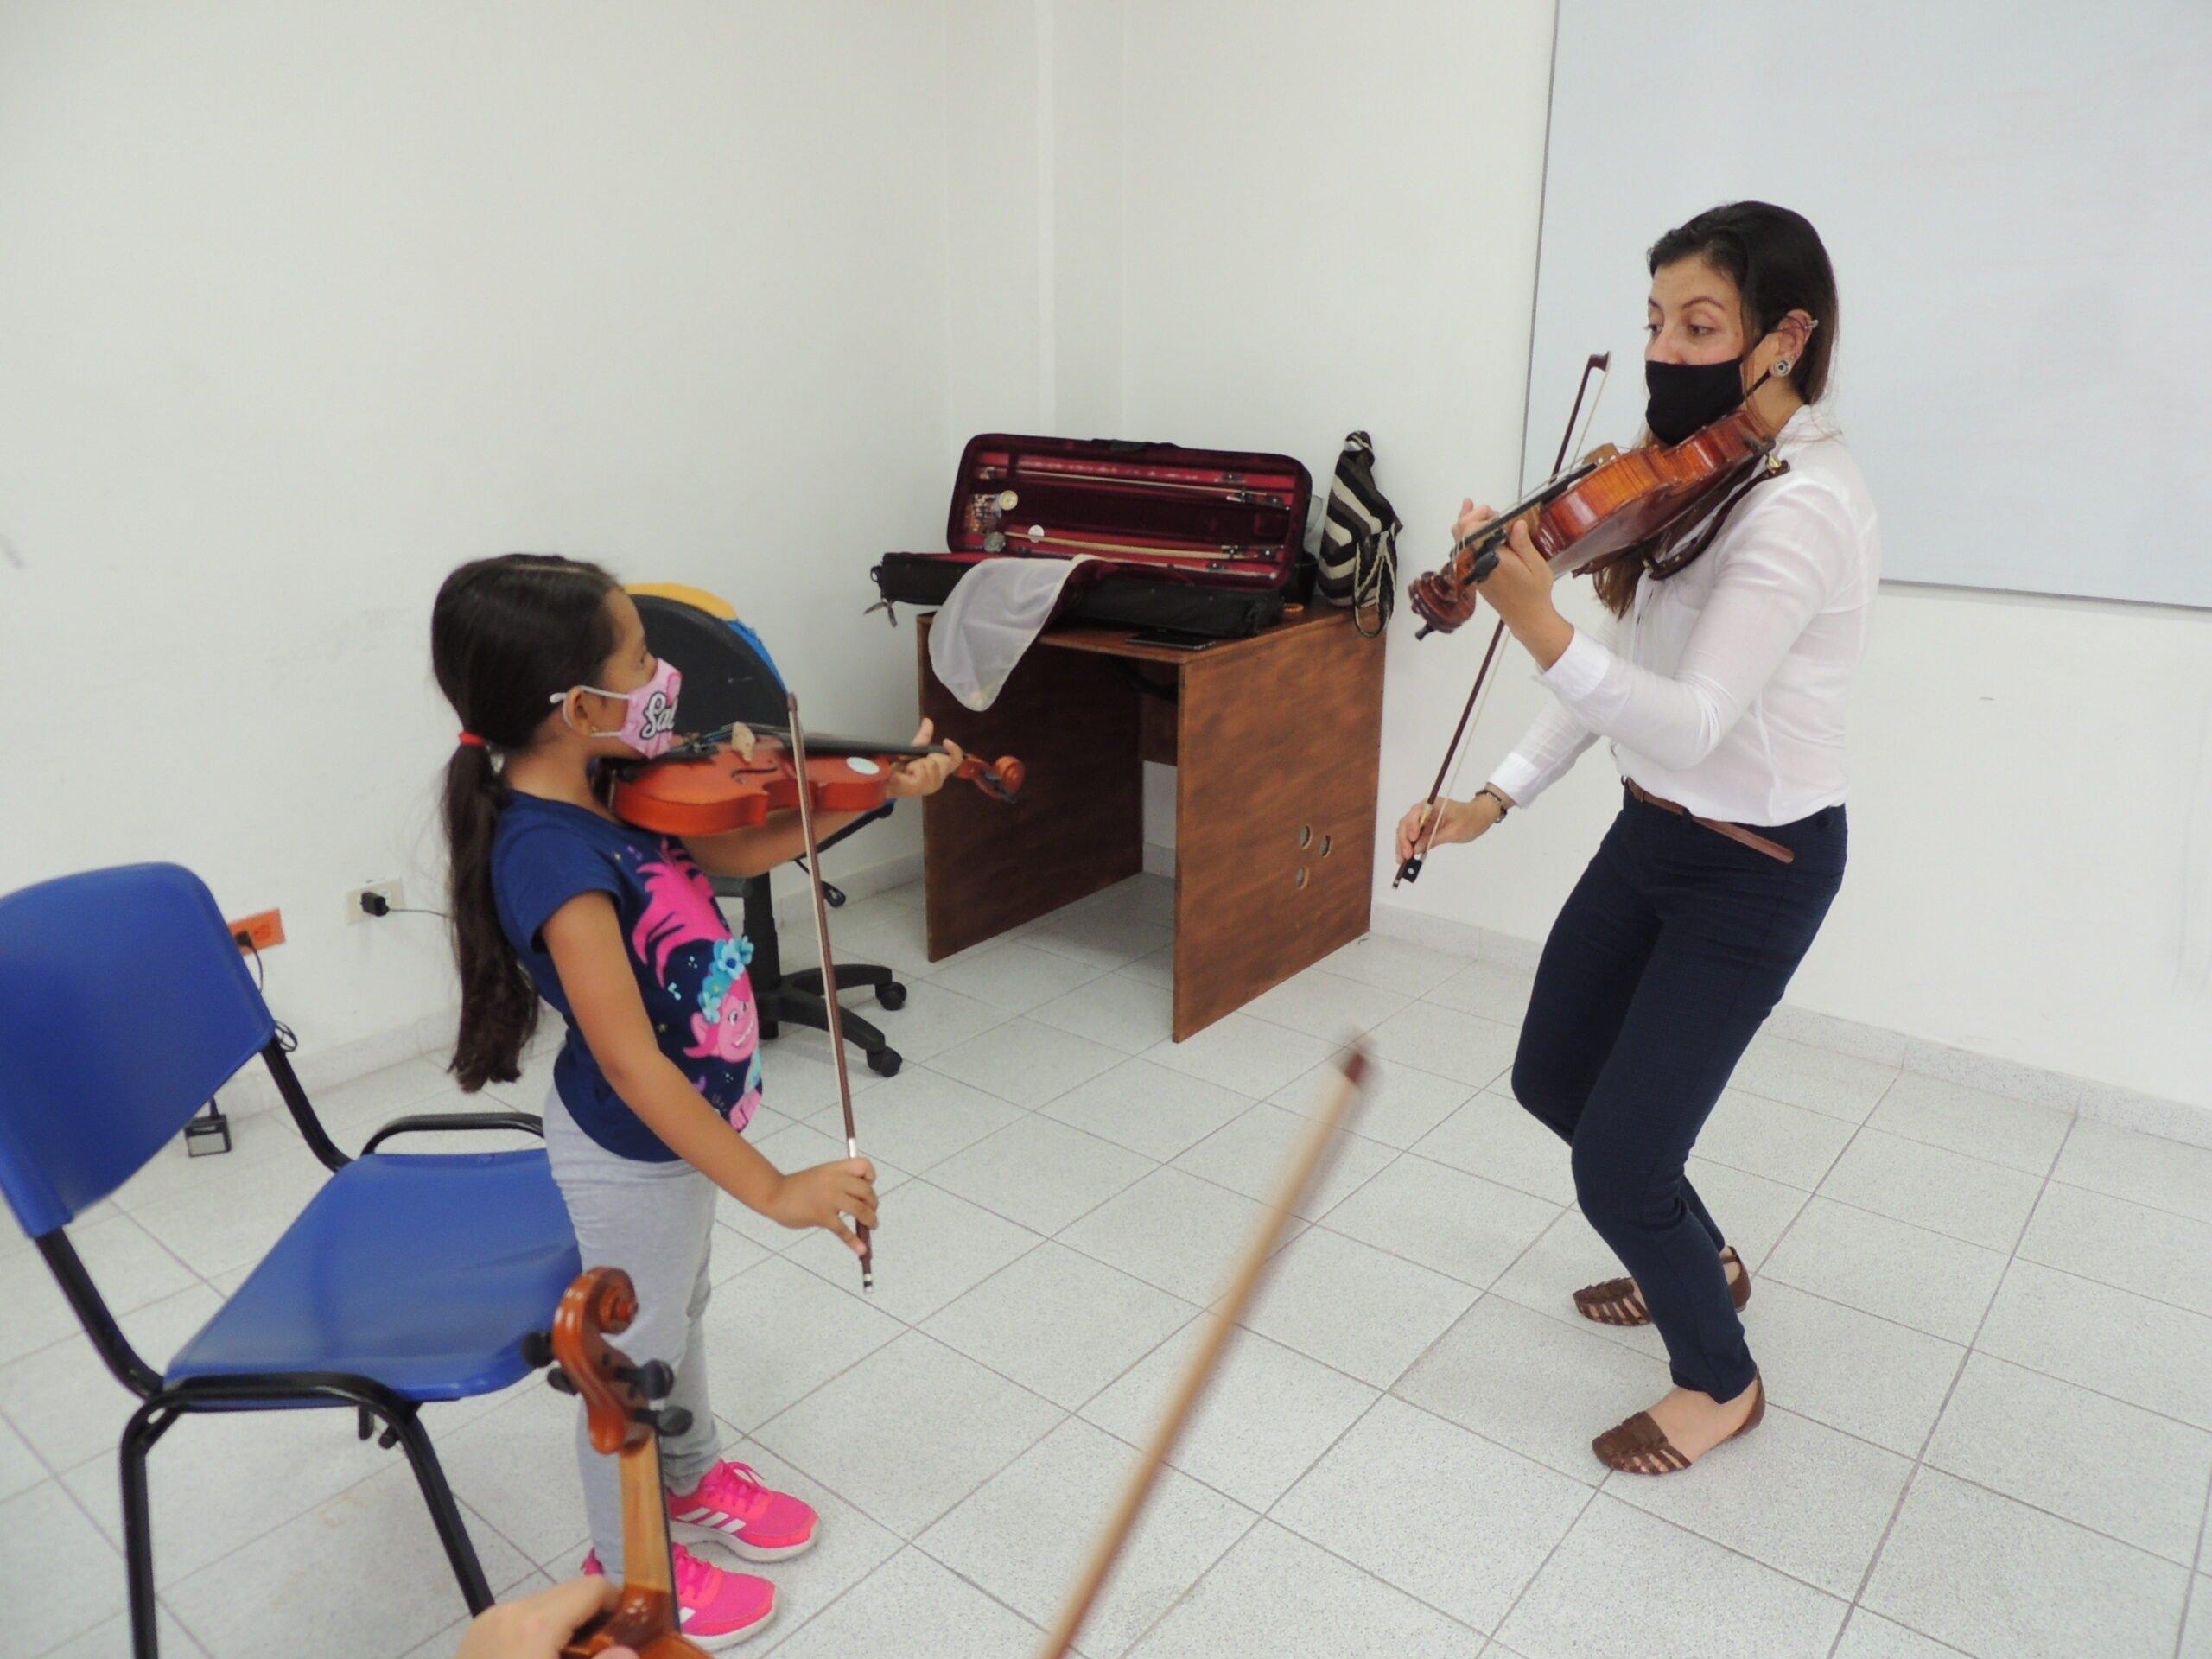 La oferta cultural llegó a las comunidades más alejadas de Pereira